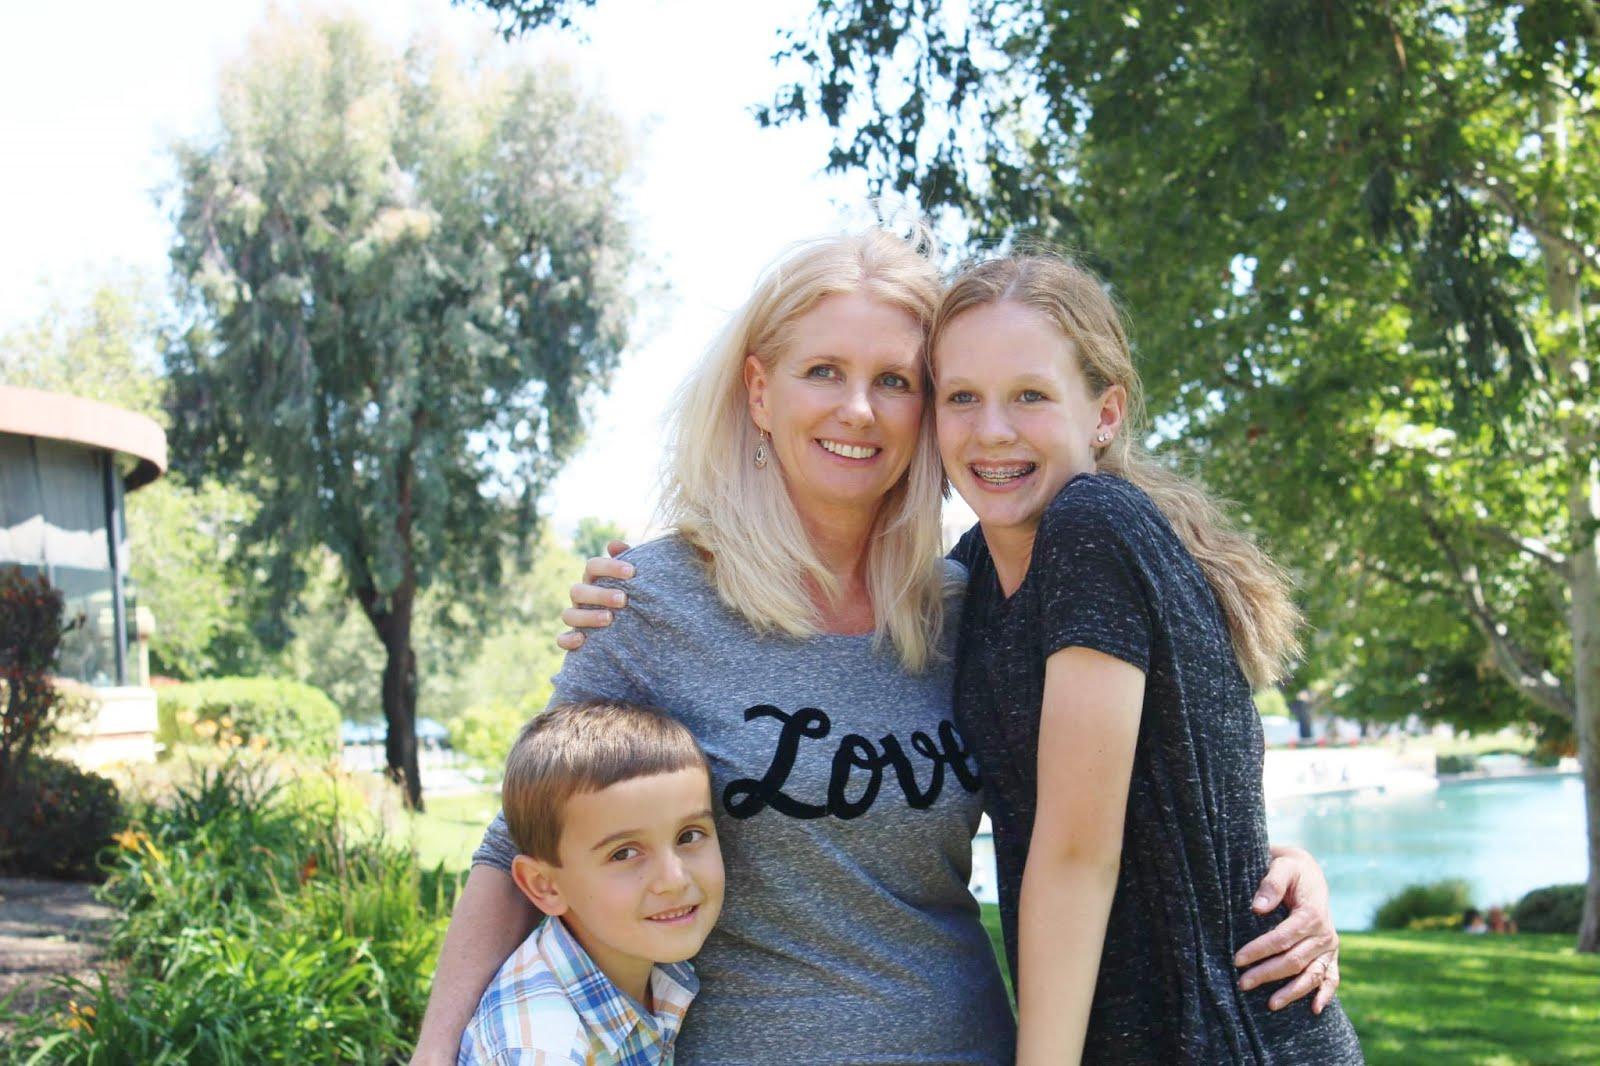 Brody, Nana, Kenz